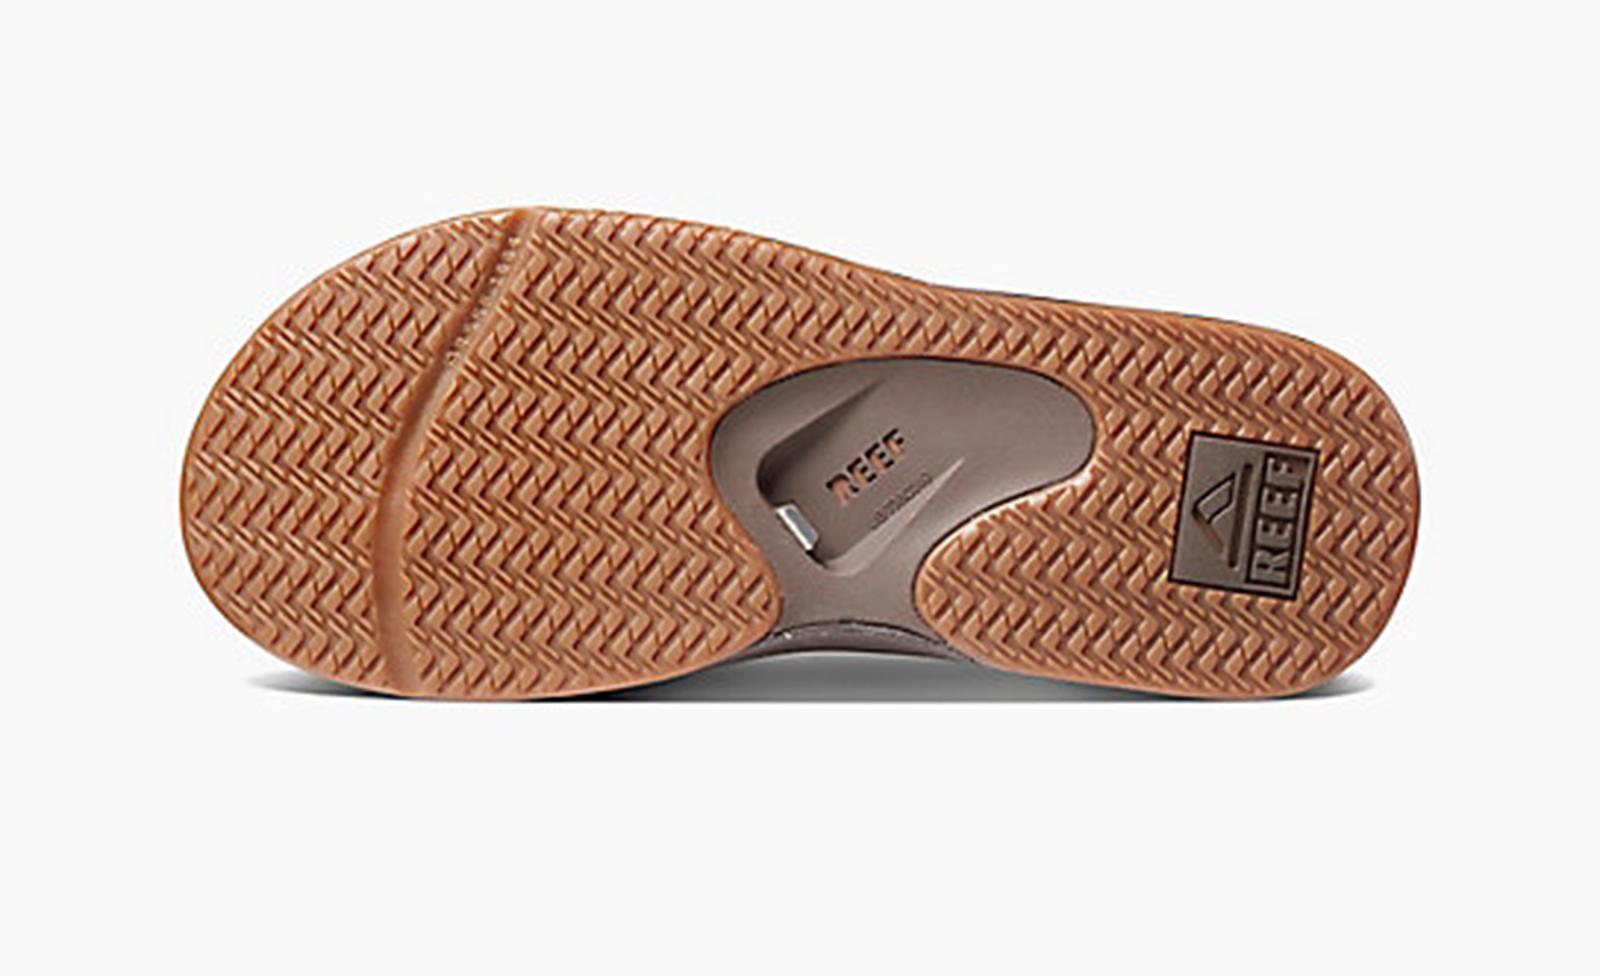 f9ebebb2957554 ... Brown flip-flops with integrated bottle opener - LEATHER FANNING BROWN  ...